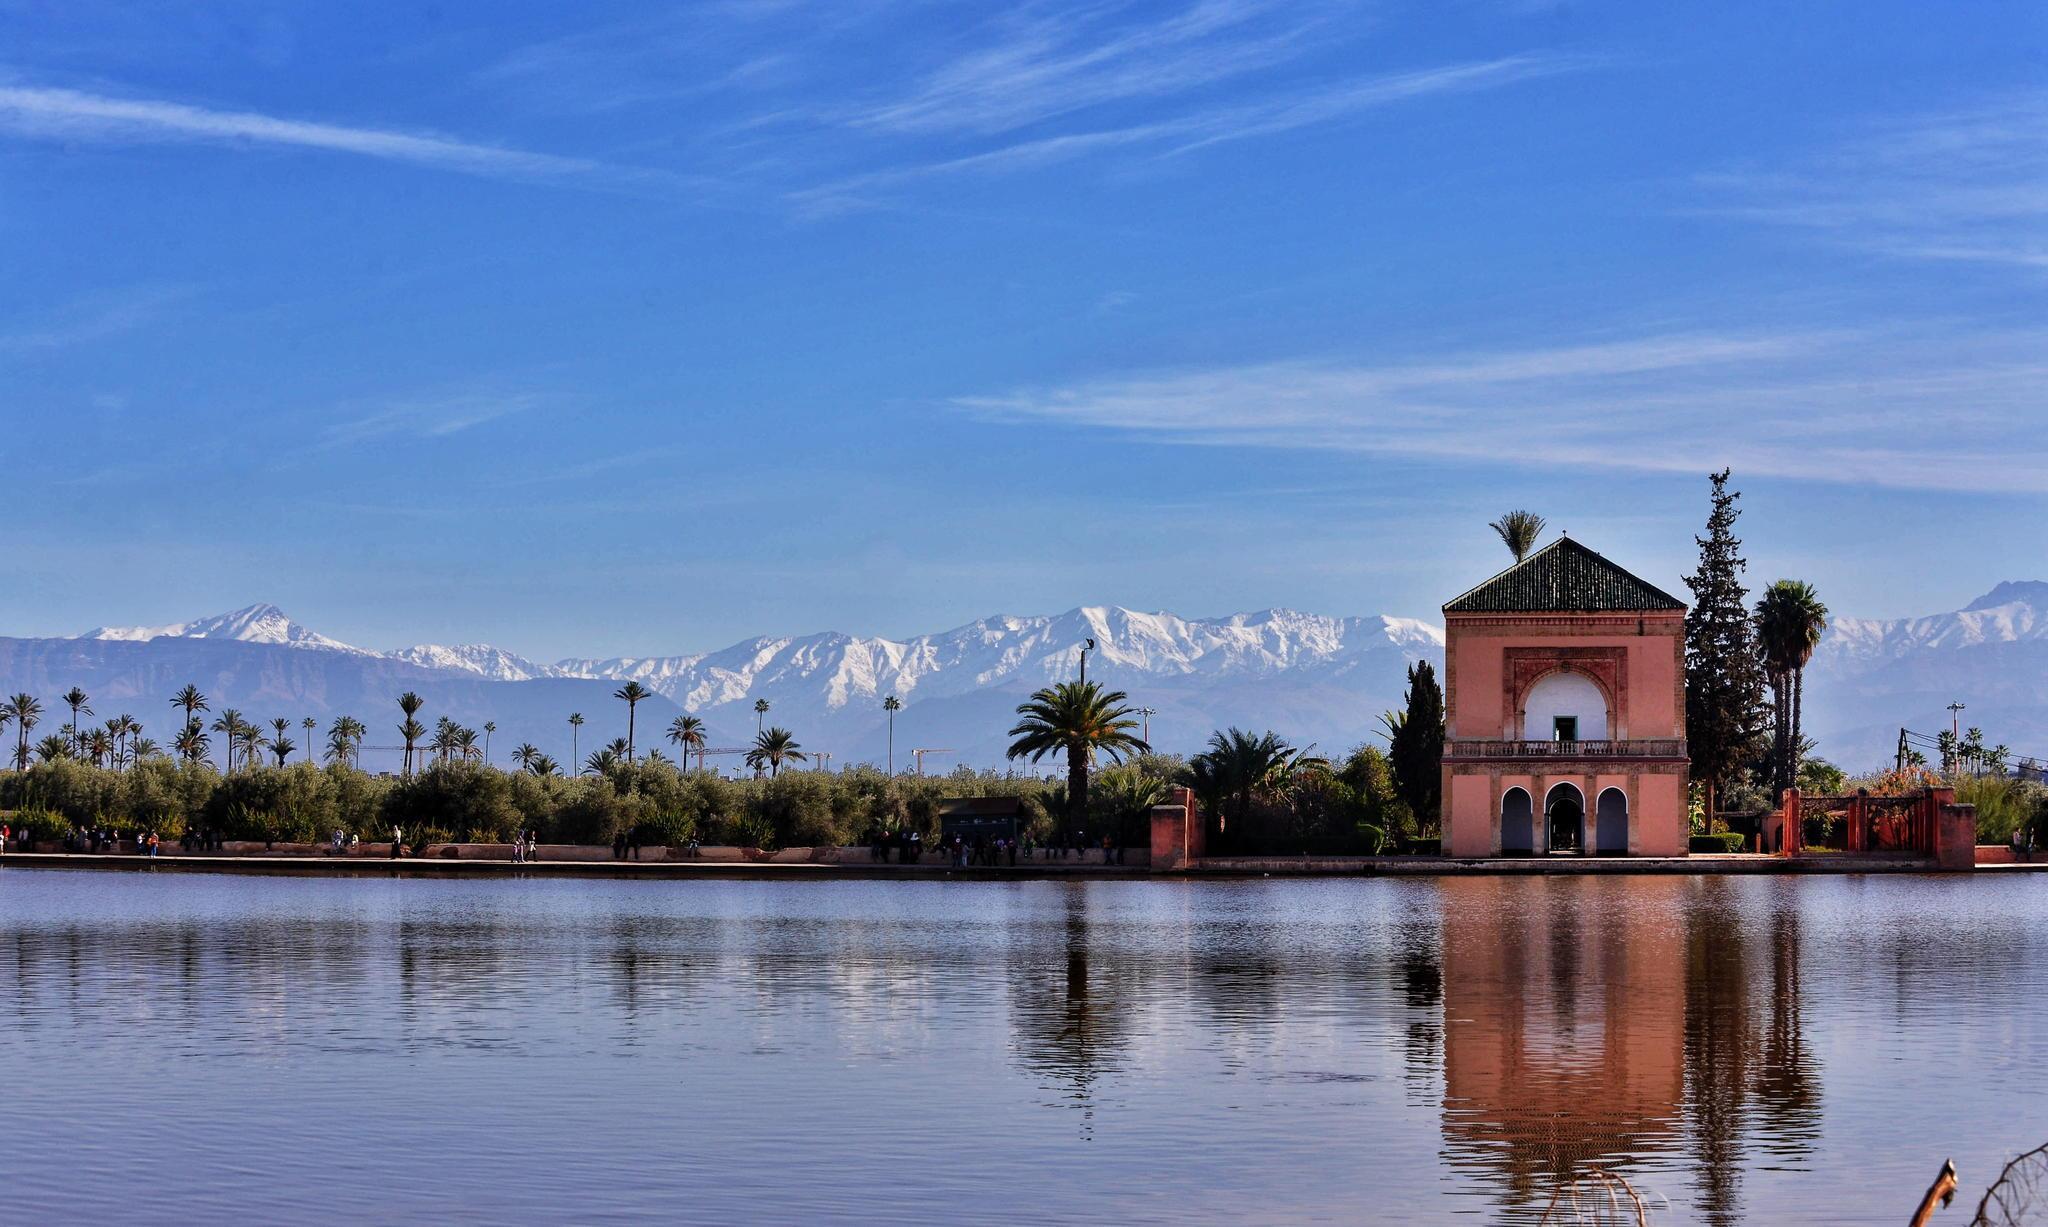 menara-marrakech-circuits-brt-1492699636